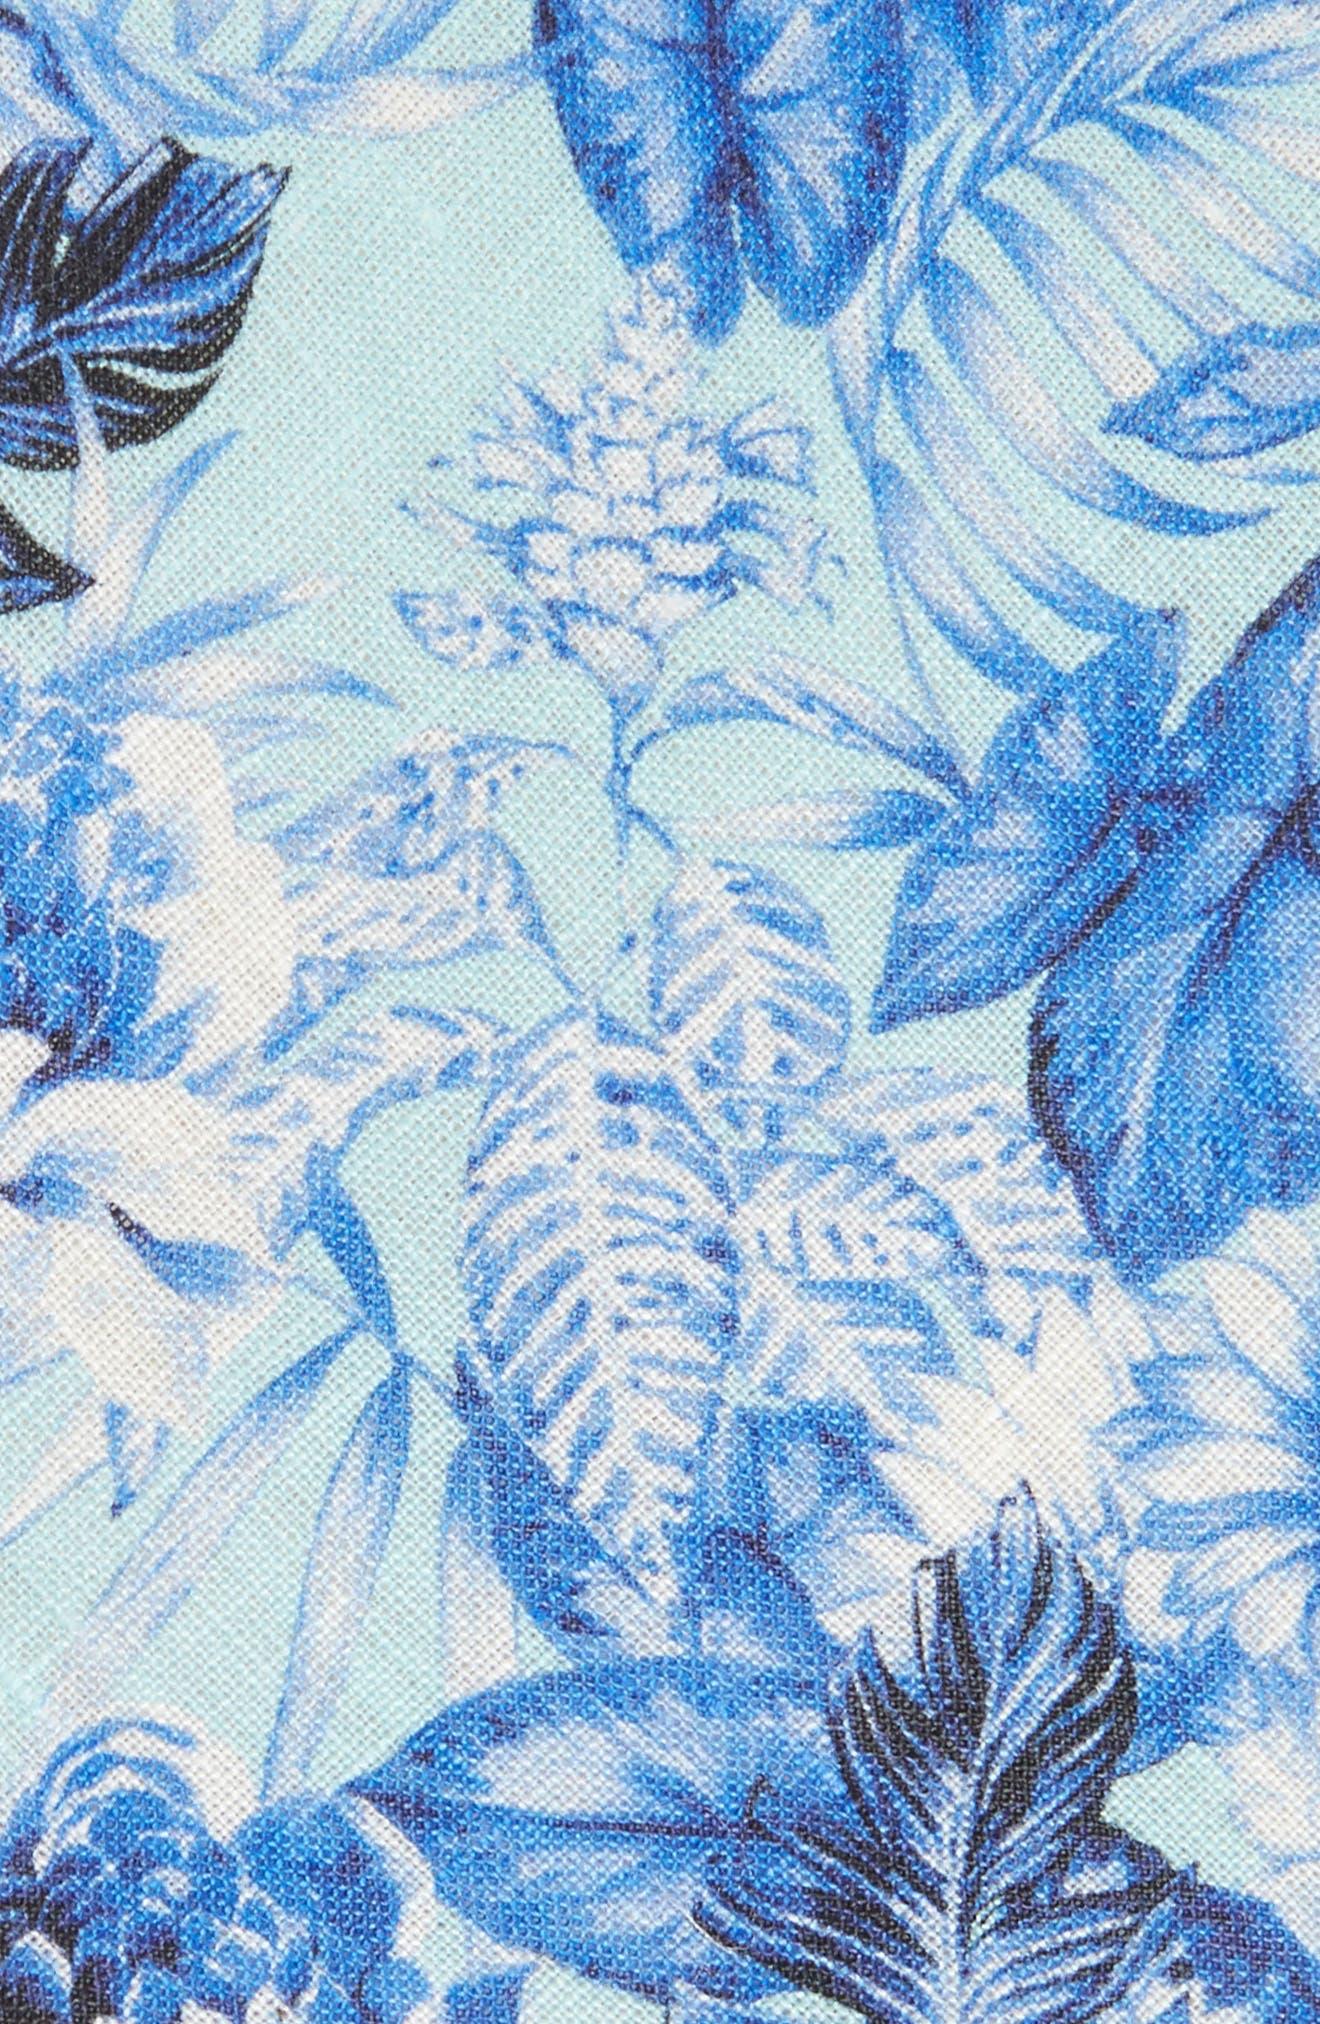 Tropic Fever Linen Tie,                             Alternate thumbnail 2, color,                             400